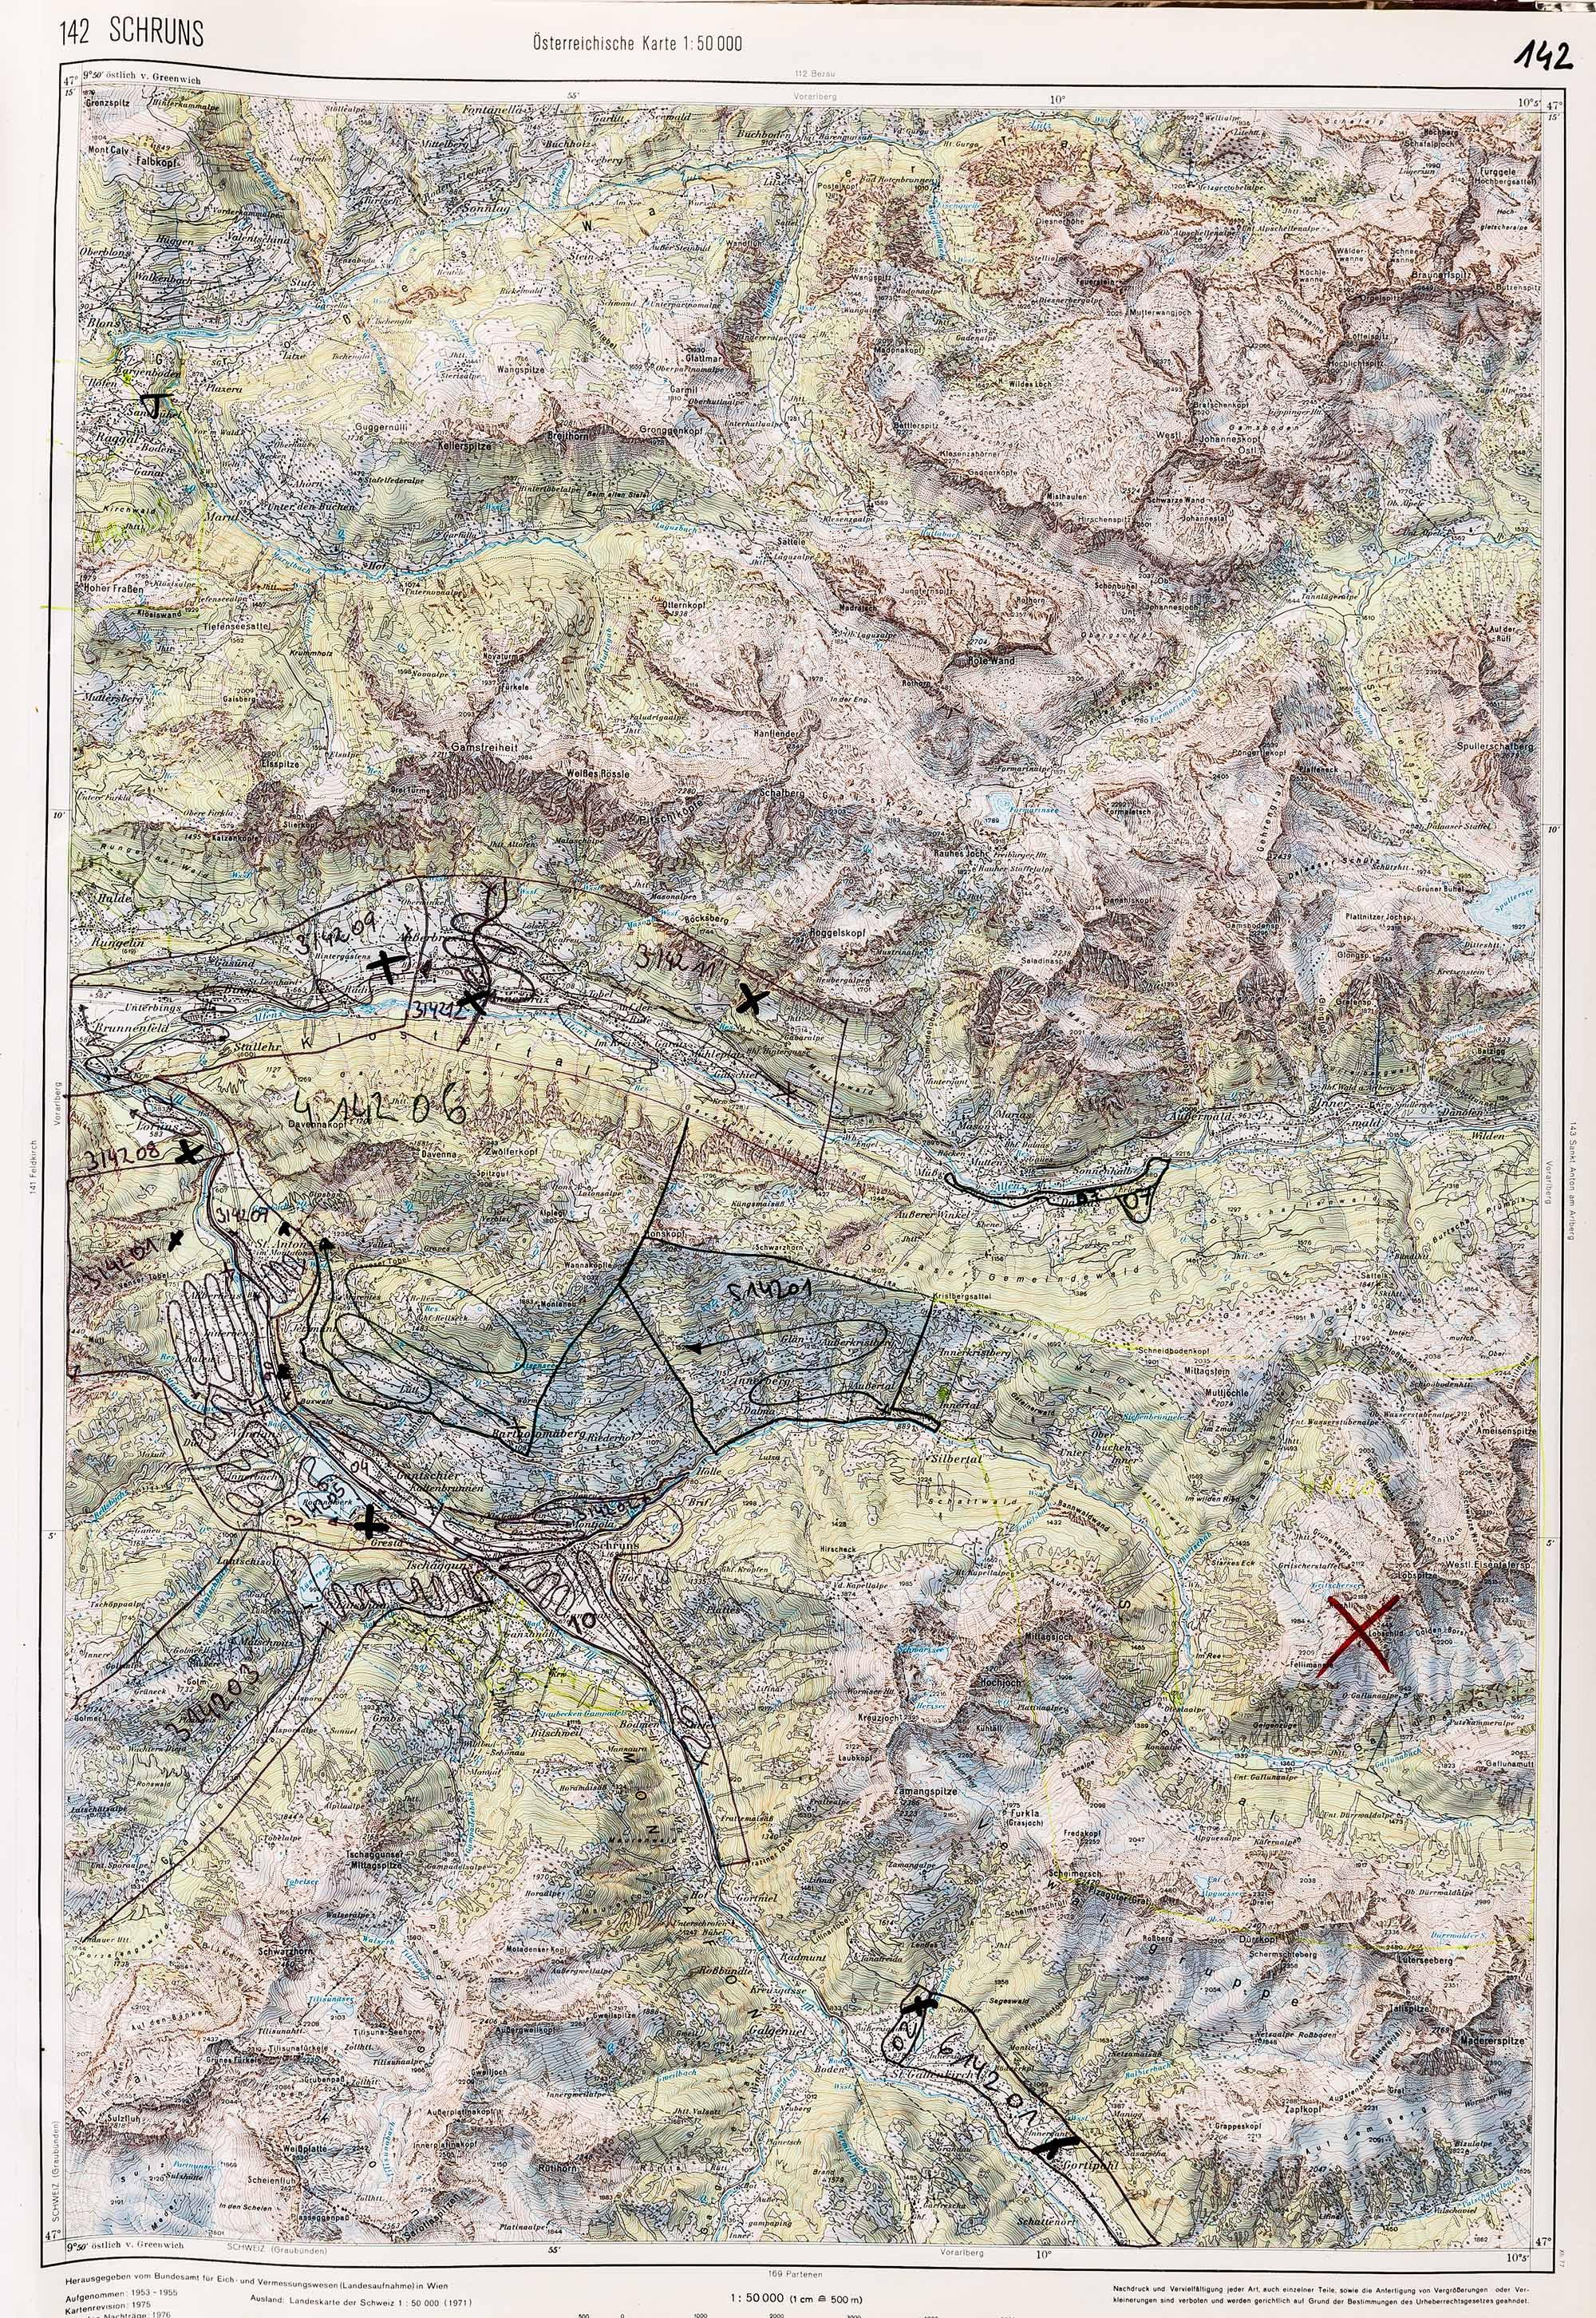 1983-1986 Karte 142